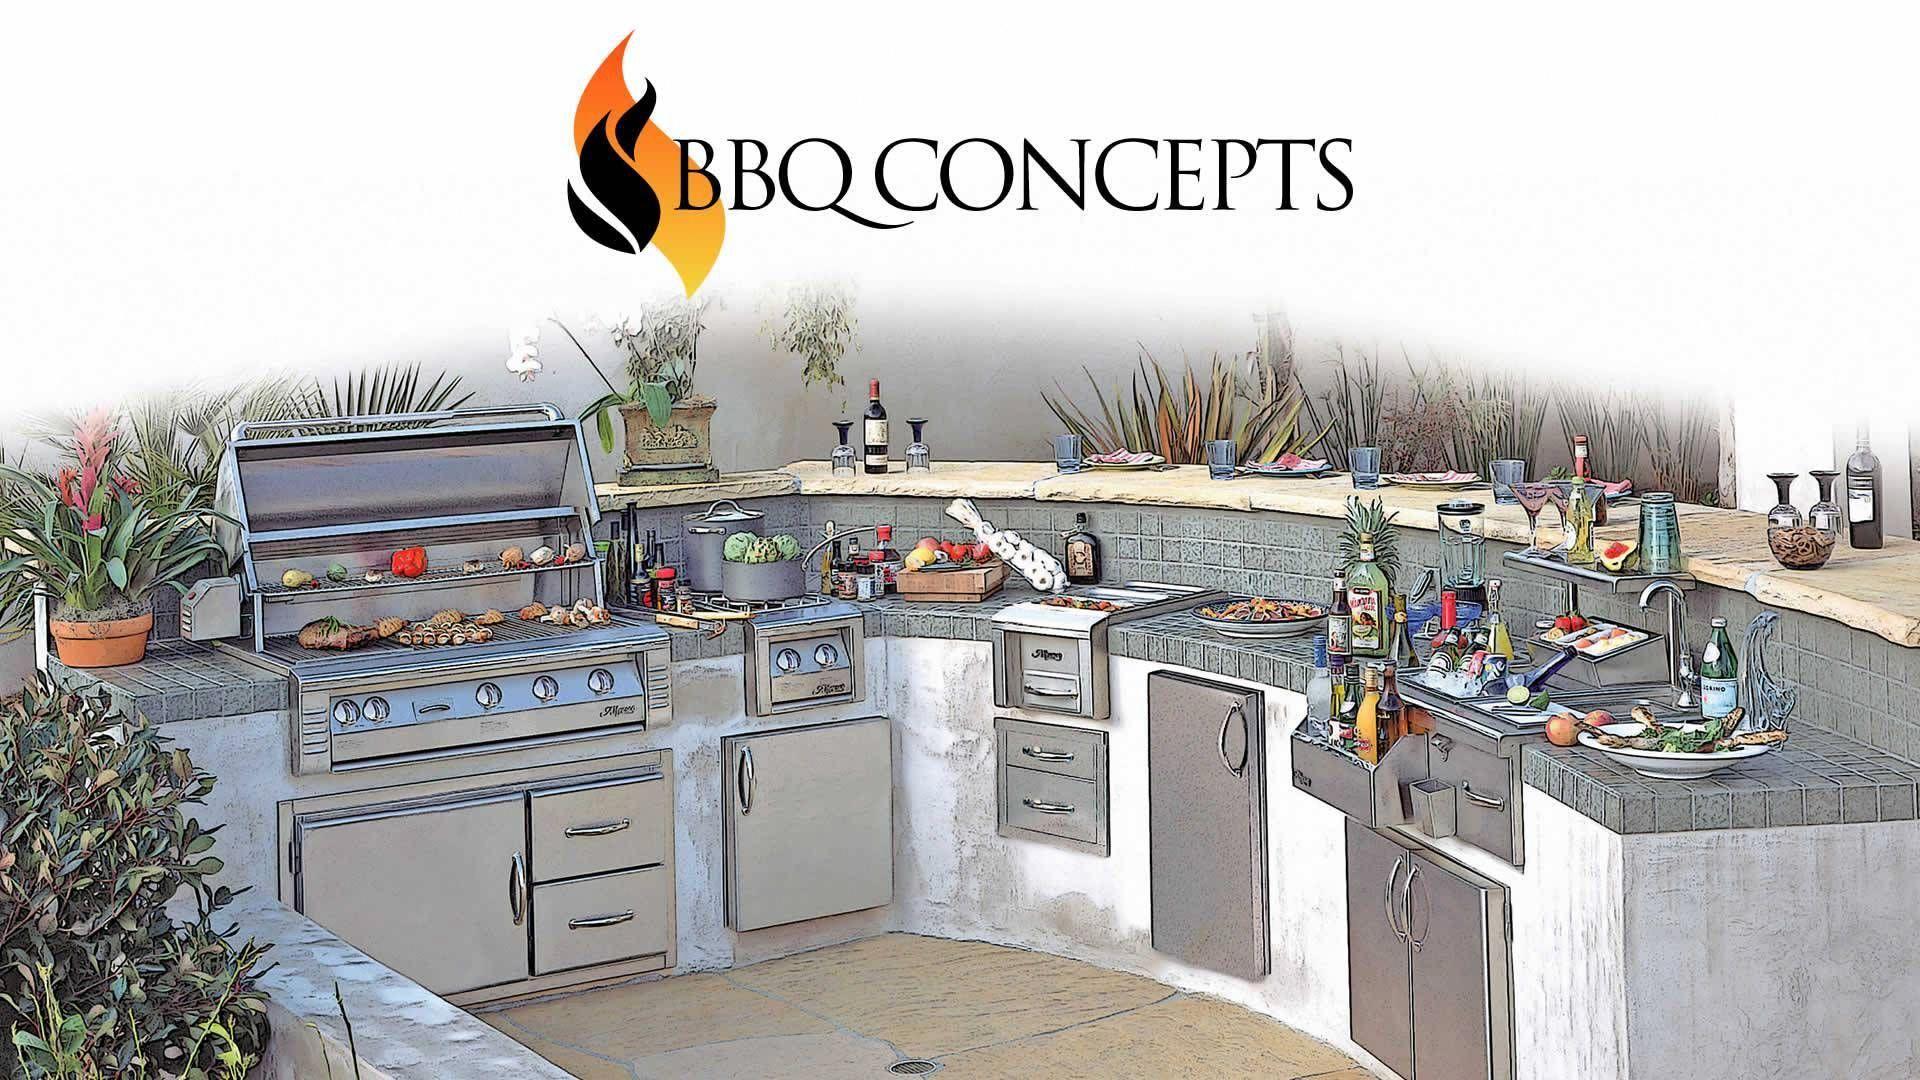 Home grill design bilder we donut just build outdoor kitchen structures we create beautiful